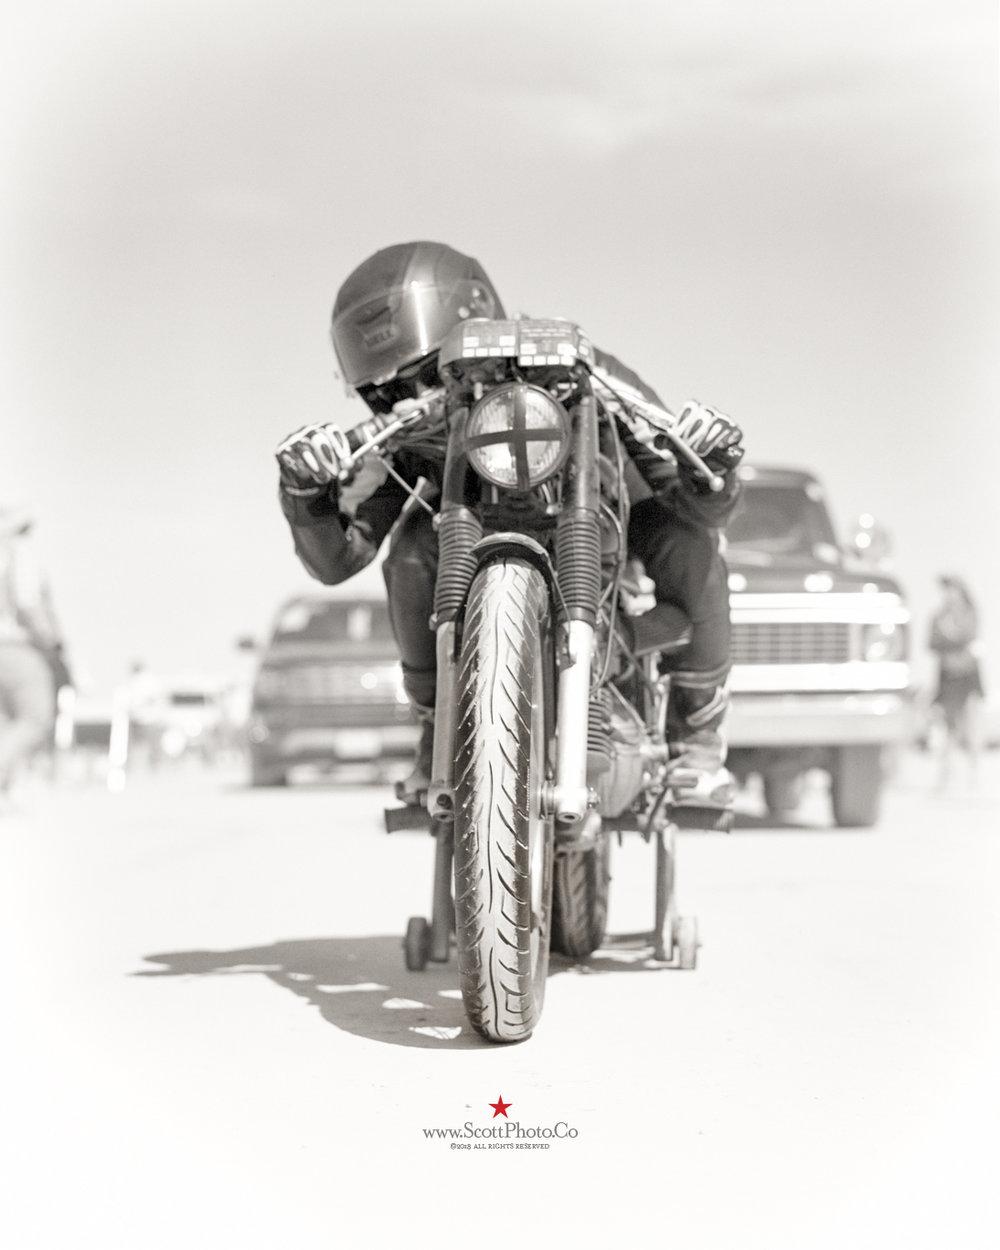 Stacie B. London El Mirage Dry Lake Bed Sunday, June 10, 2018  1967 Harley Davidson (Aermacci)